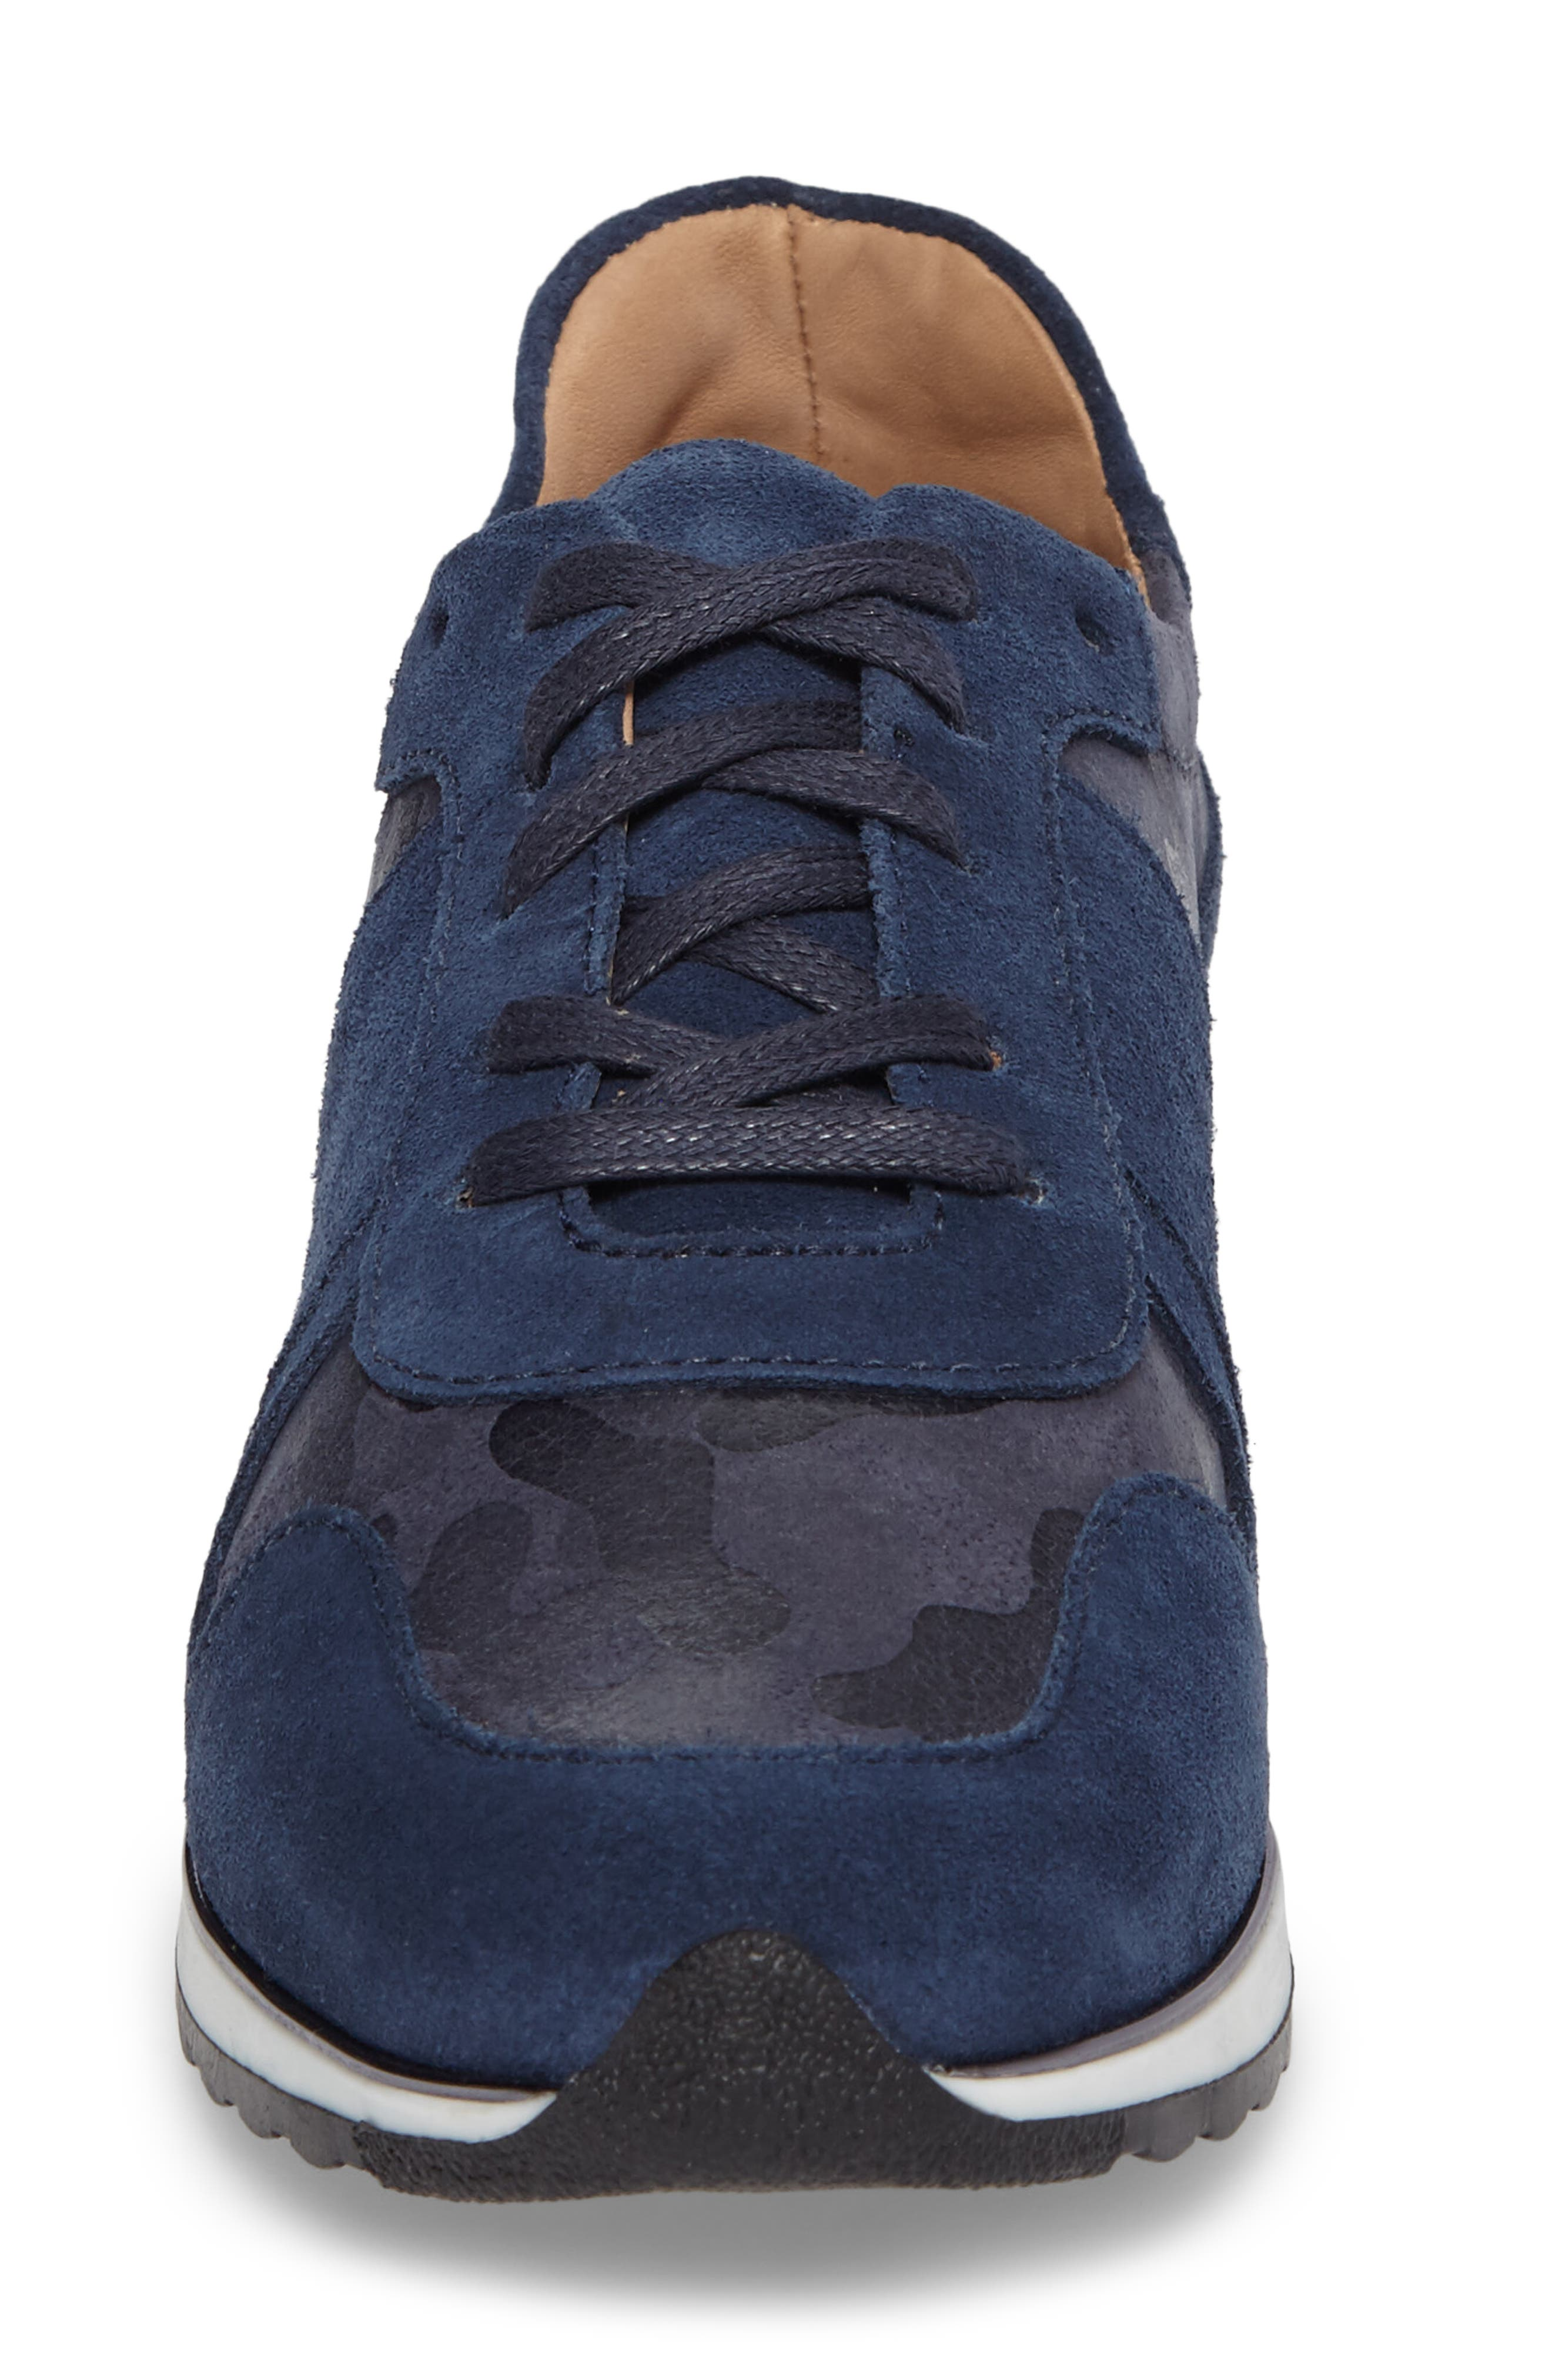 Stefani Sneaker,                             Alternate thumbnail 4, color,                             Camo Nubuck Leather